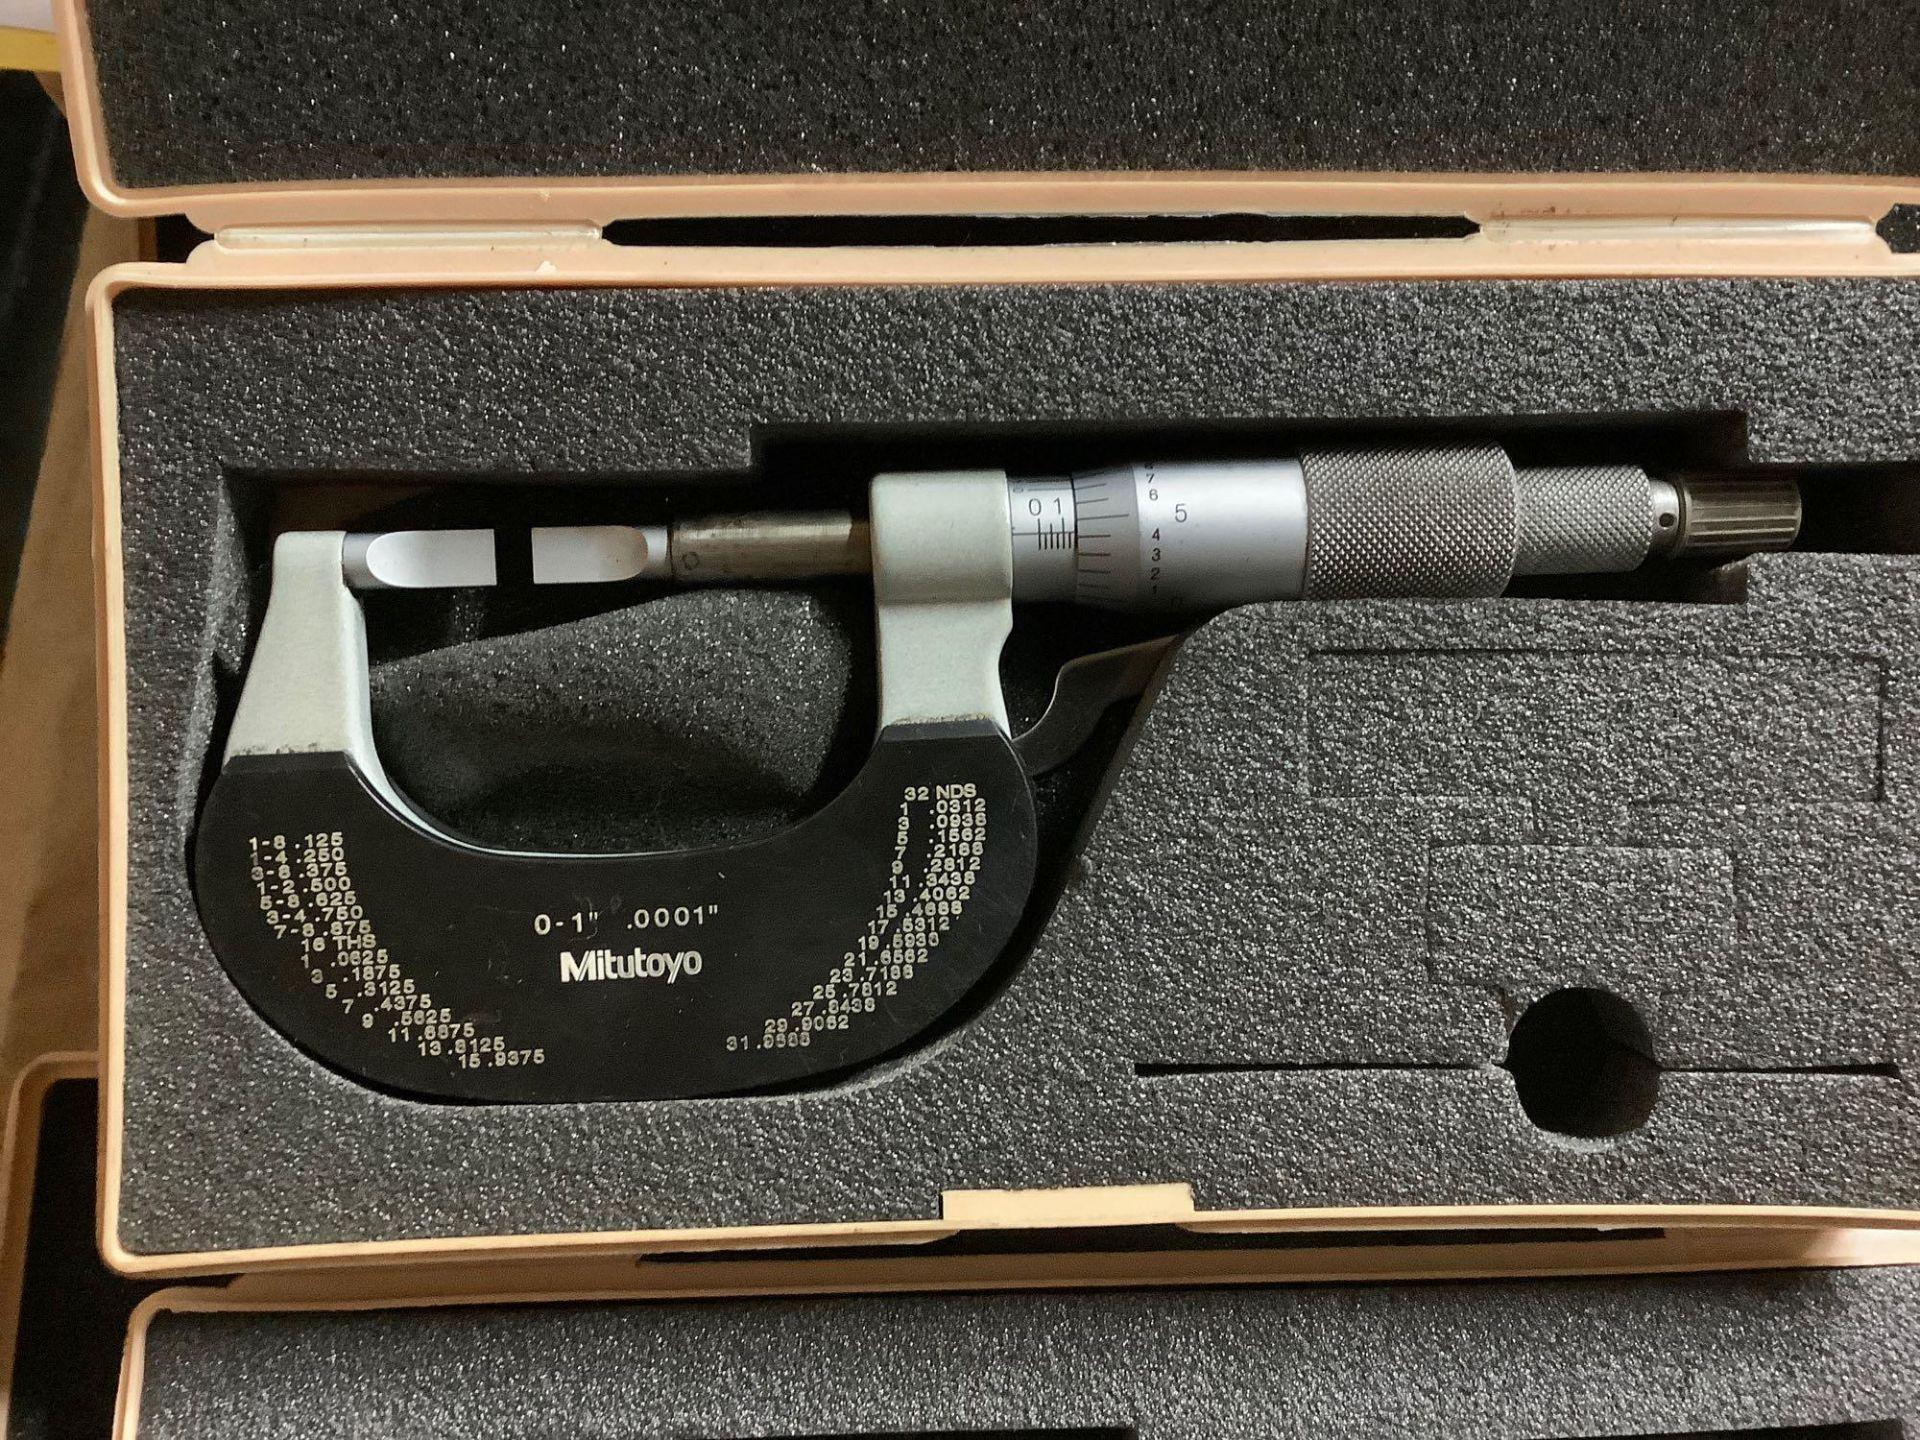 Lot of 3 Mitutoyo Blade Micrometers - Image 4 of 5